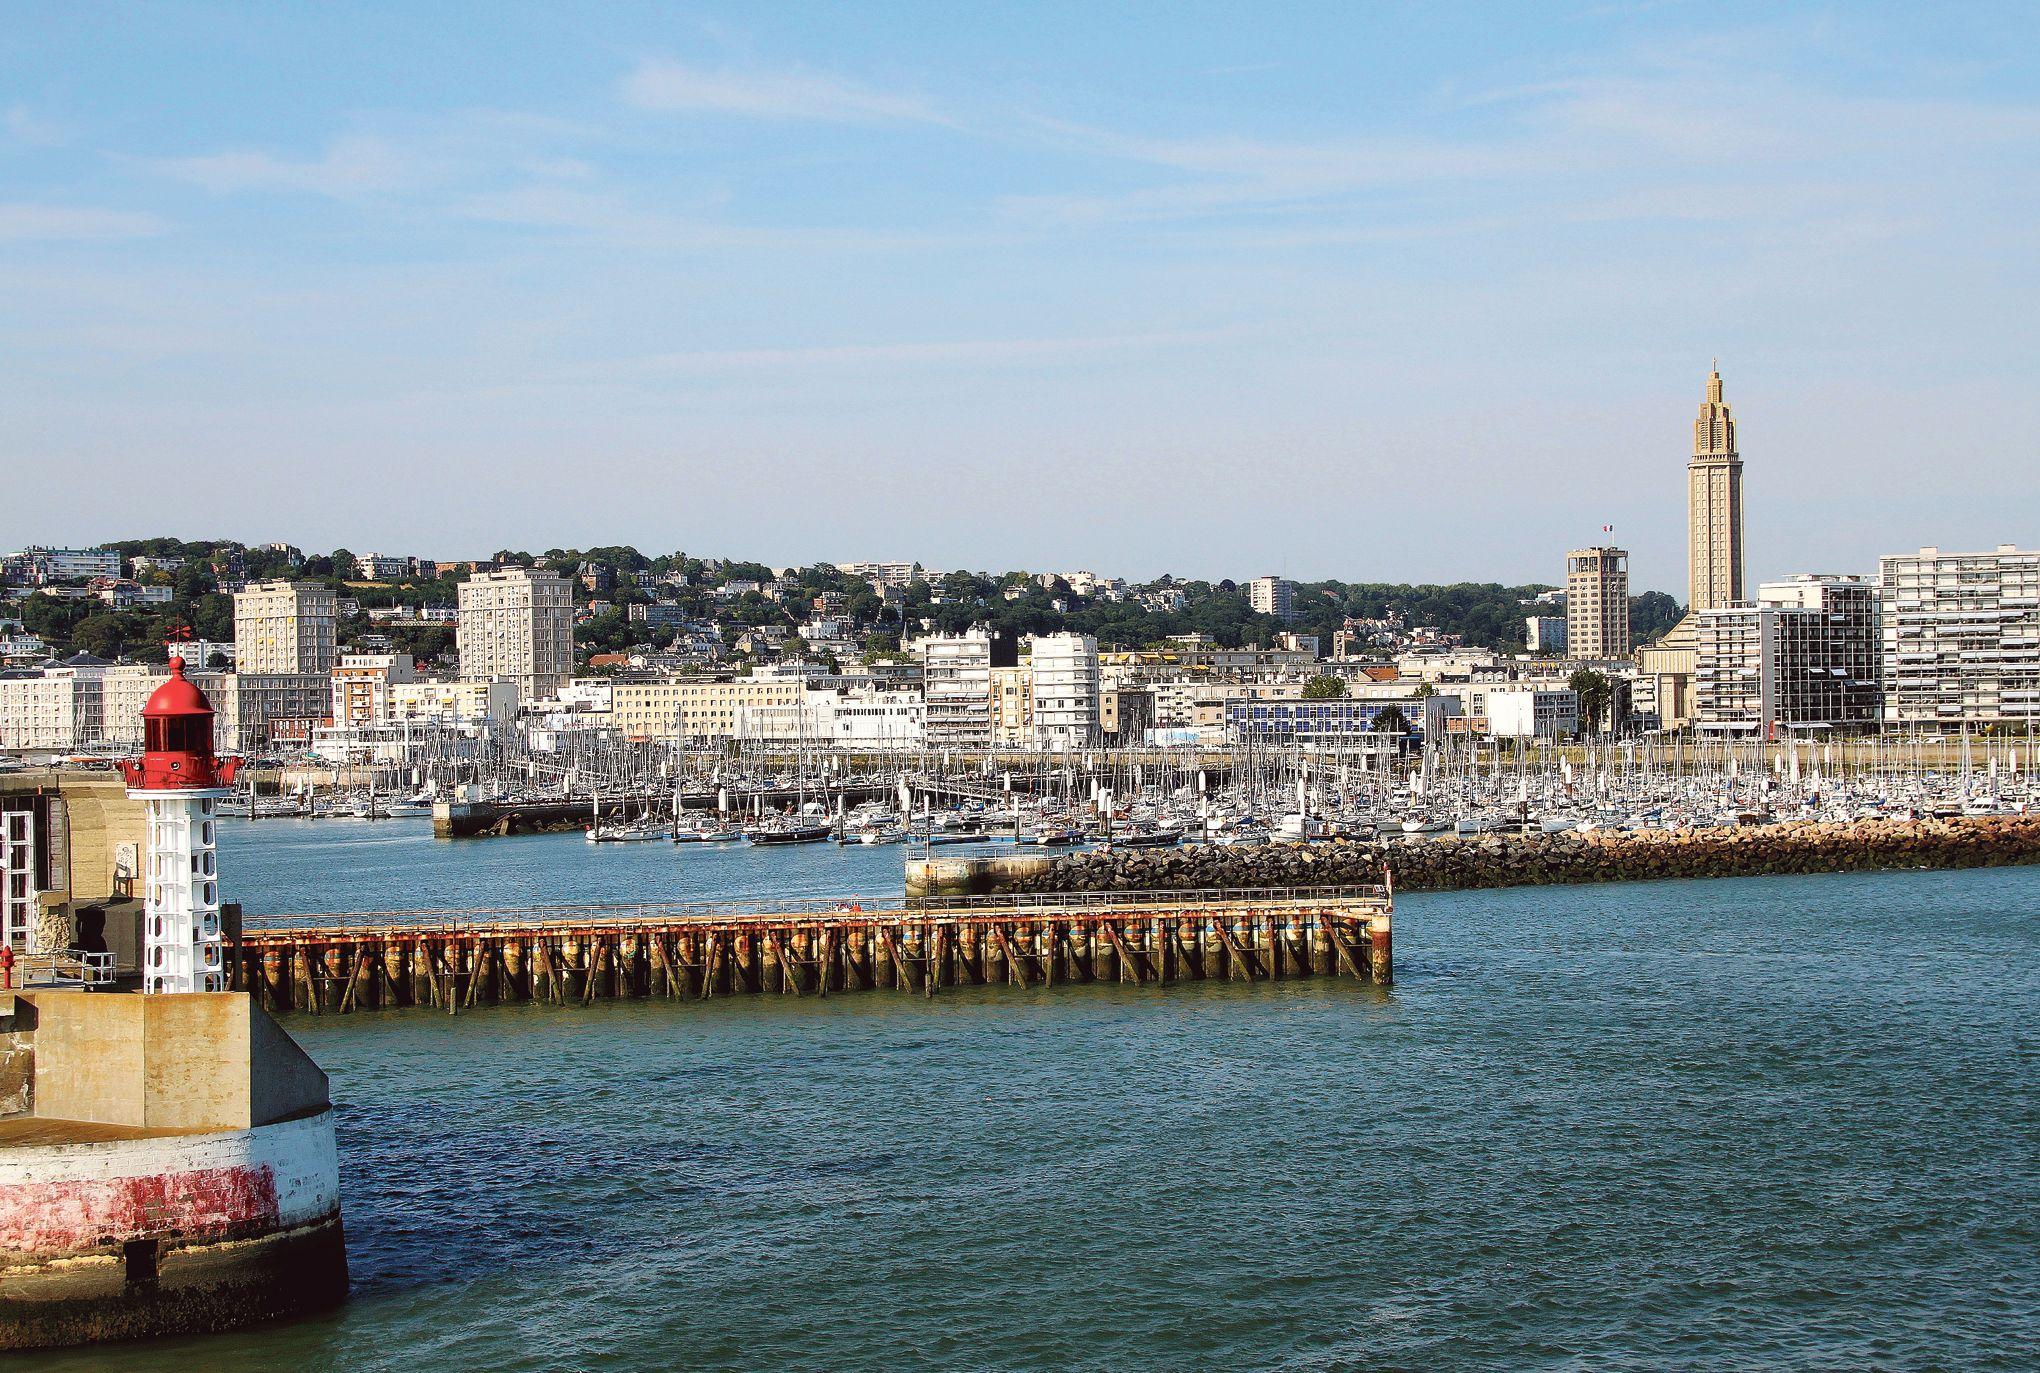 Le Havre en trente-six heures chrono